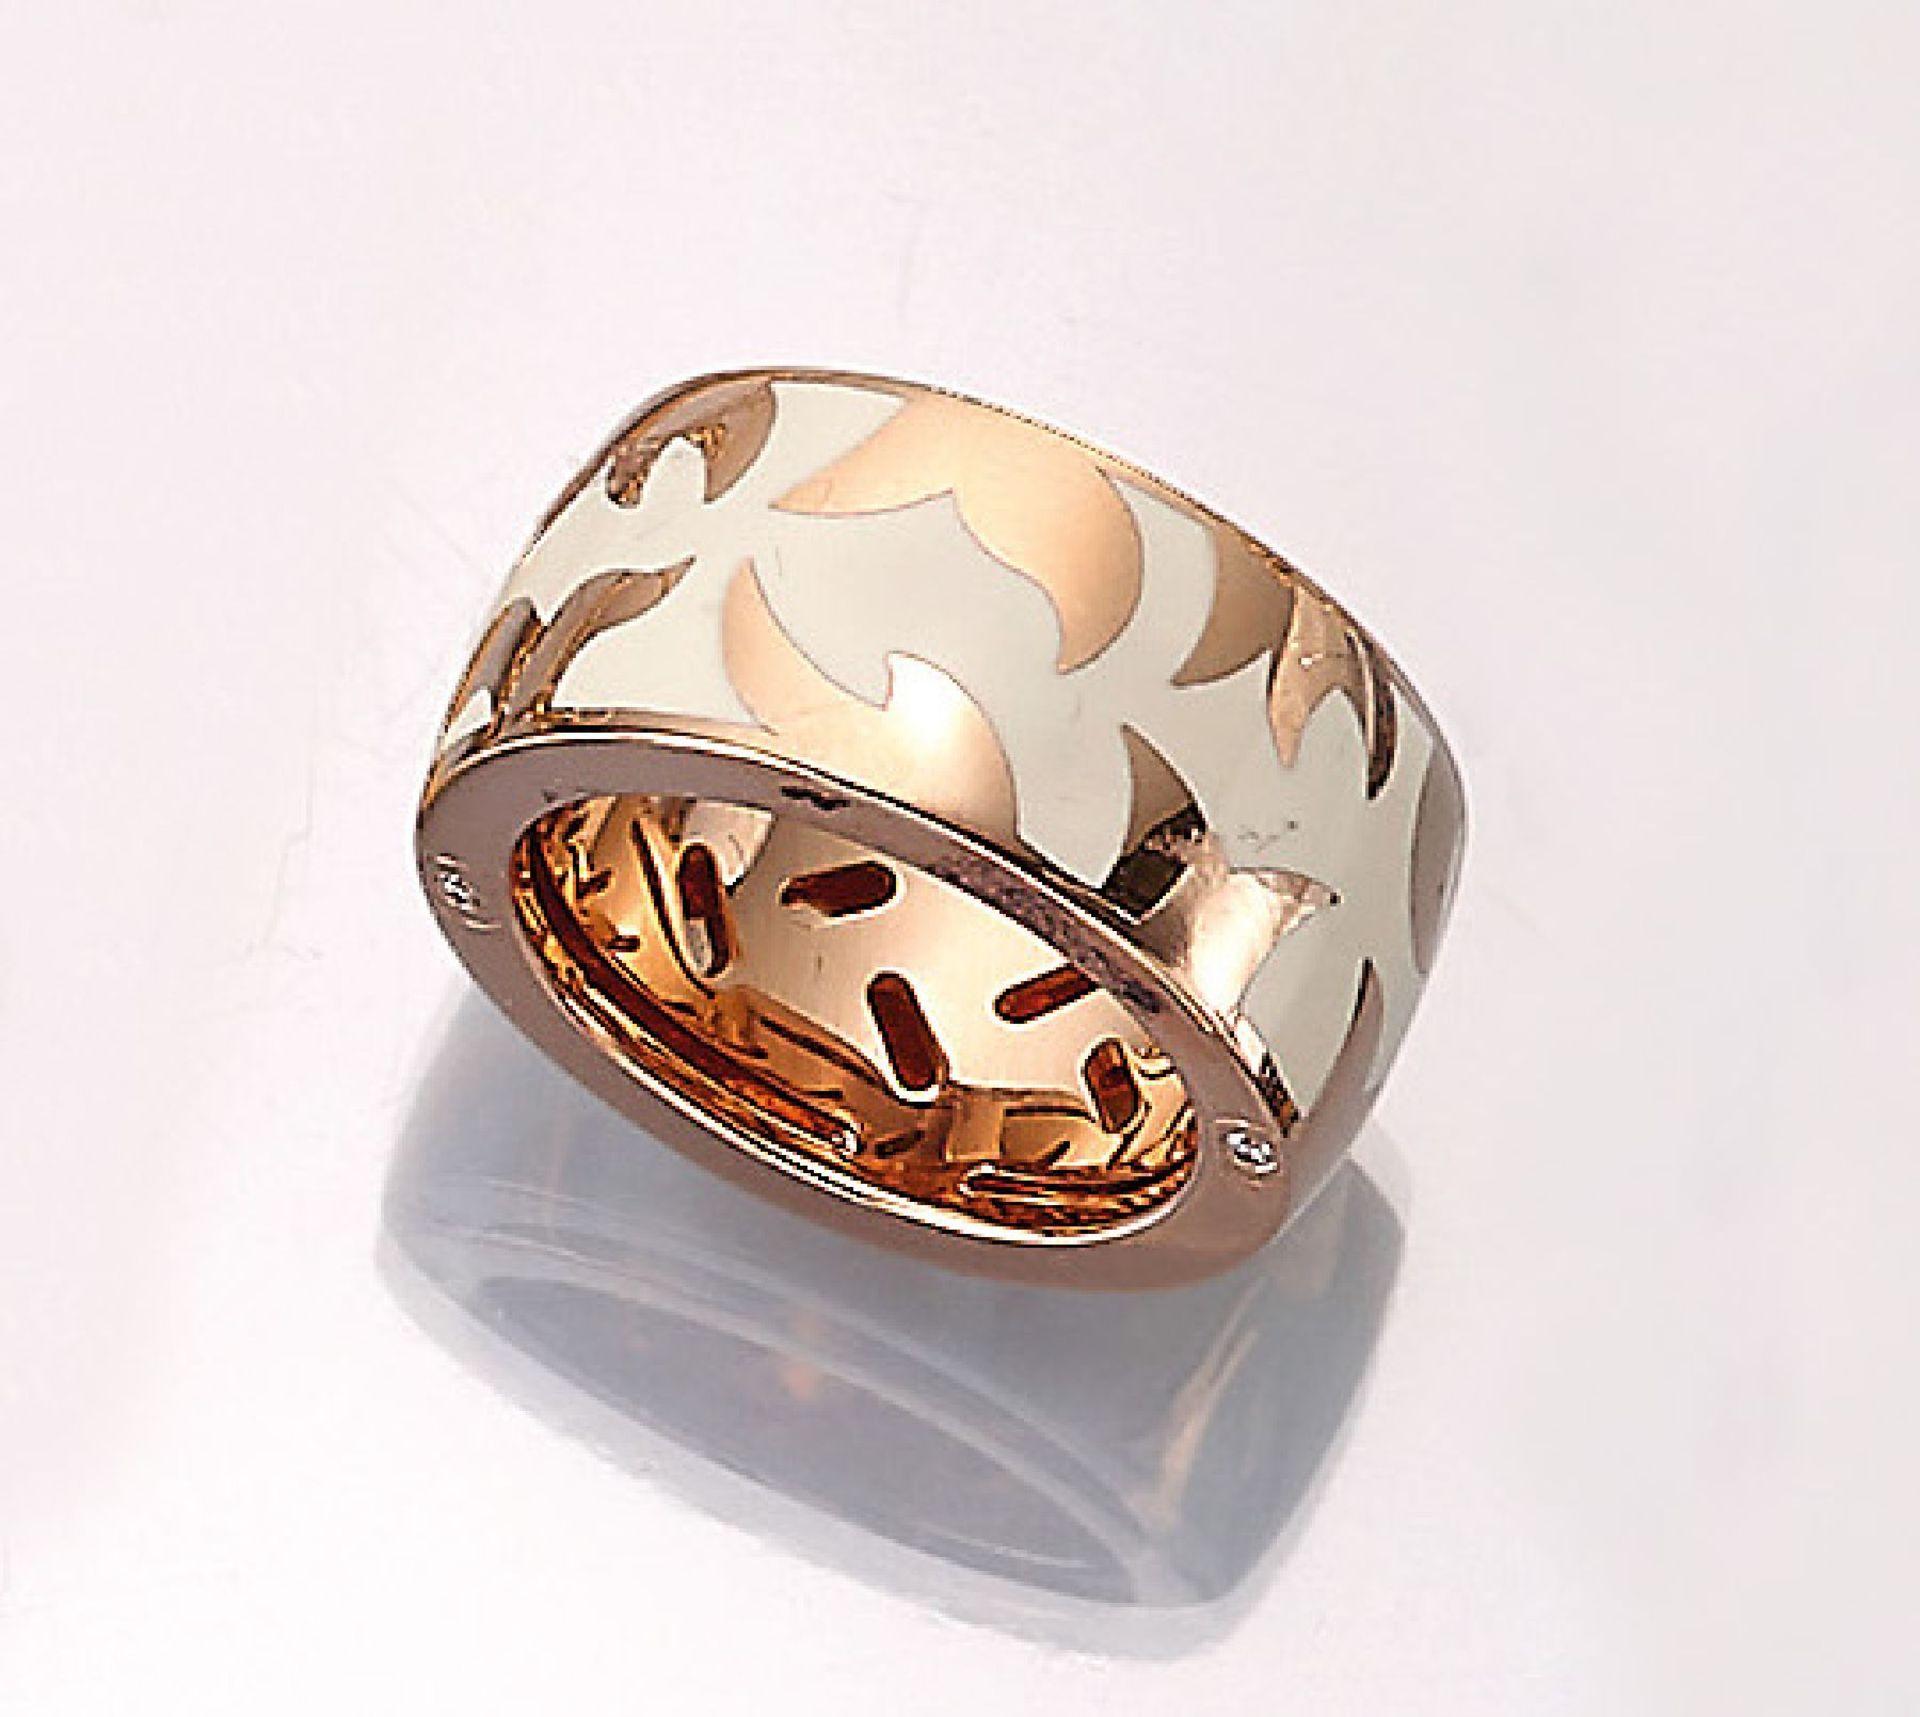 Los 61523 - 18 kt gold LEO WITTWER ring with enamel , RoseG 750/000, cream white enameled elements, ringsize 55,